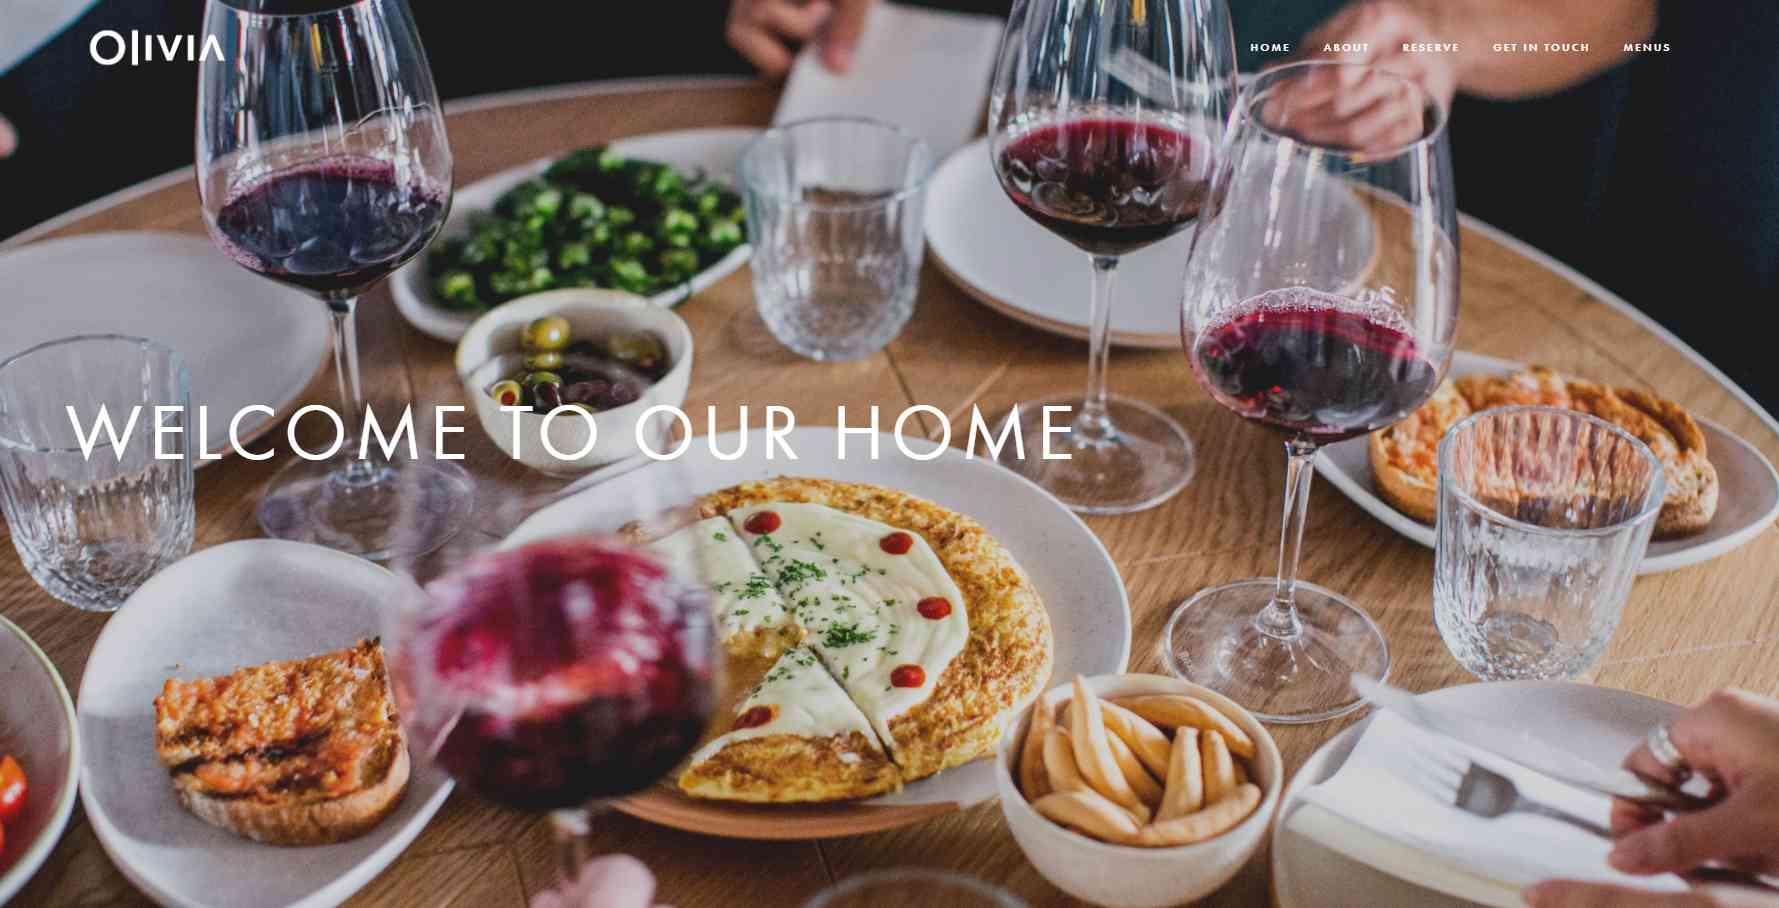 olivia Top Mediterranean Restaurants in Singapore